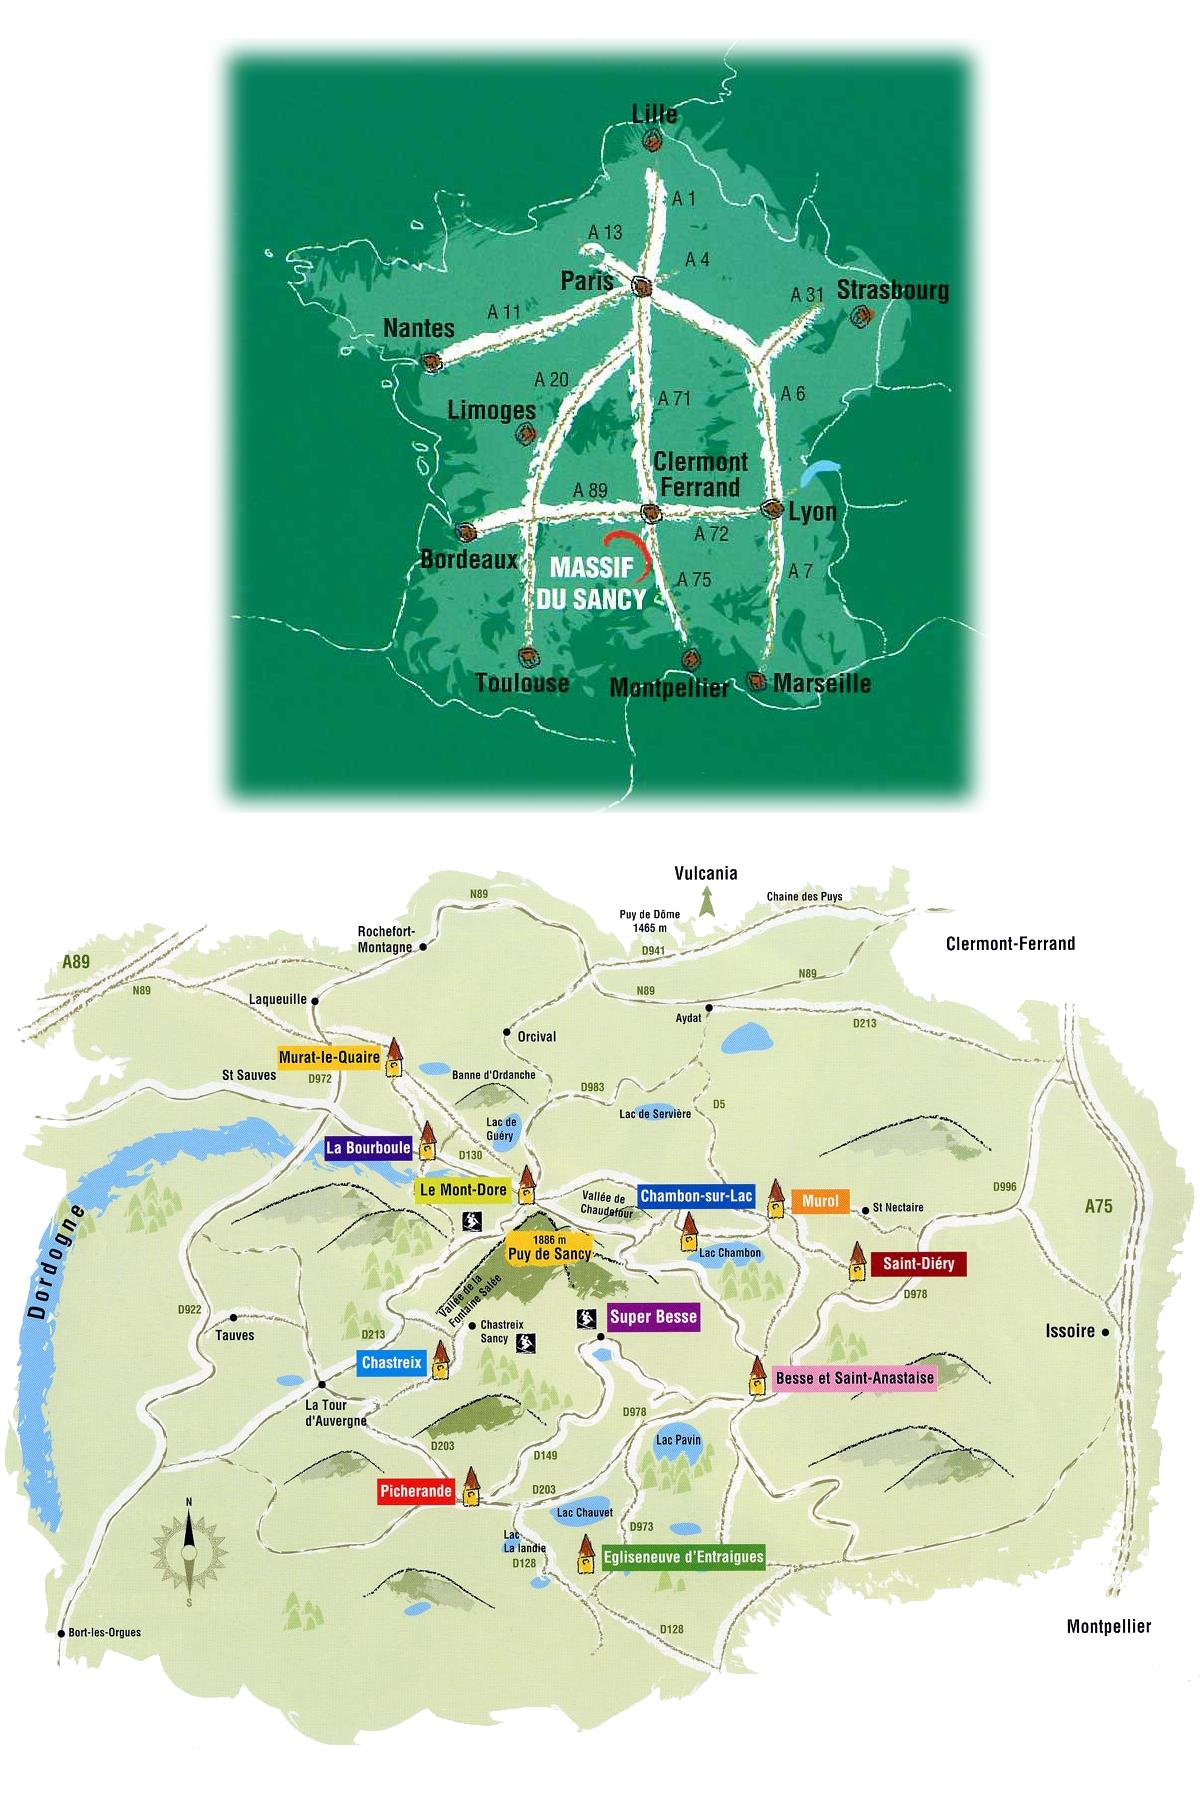 Plan d'accès Super Besse